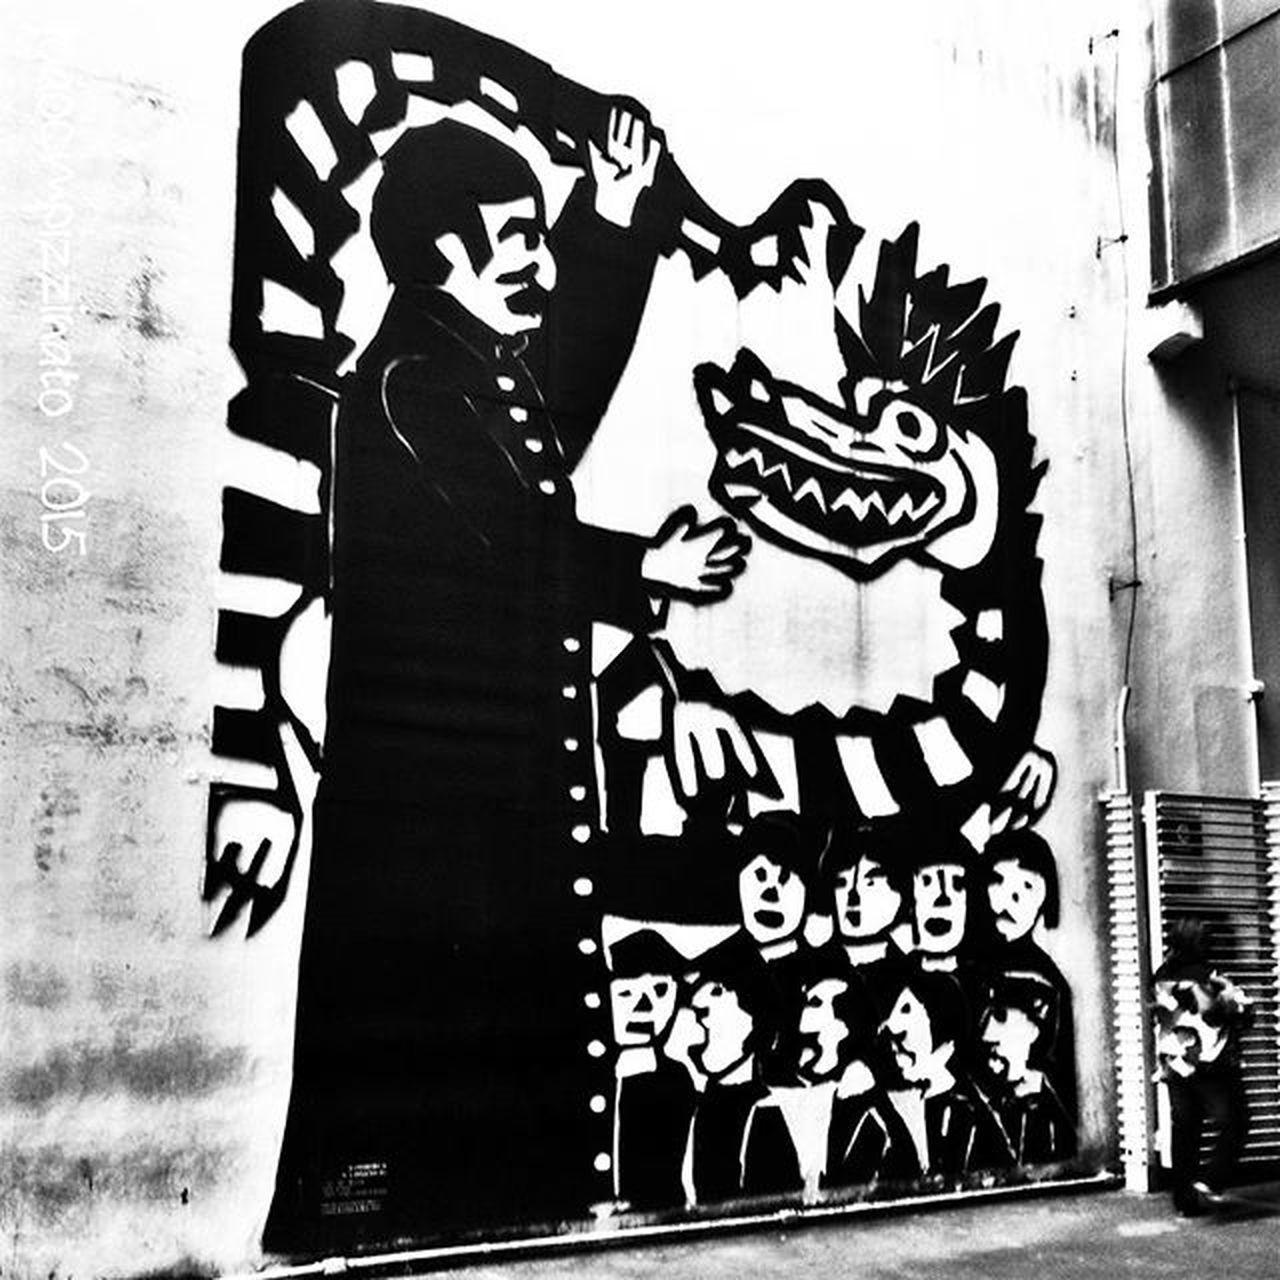 Graffiti Graffitiart Art Streetart UrbanART Streetphotography Urban Streetphoto_brasil Blackandwhite City Zonasul Saopaulo Brasil Photograph Photography Flaming_abstracts Mundoruasp Olhonaruasp Urbexbrasil Urbexsp